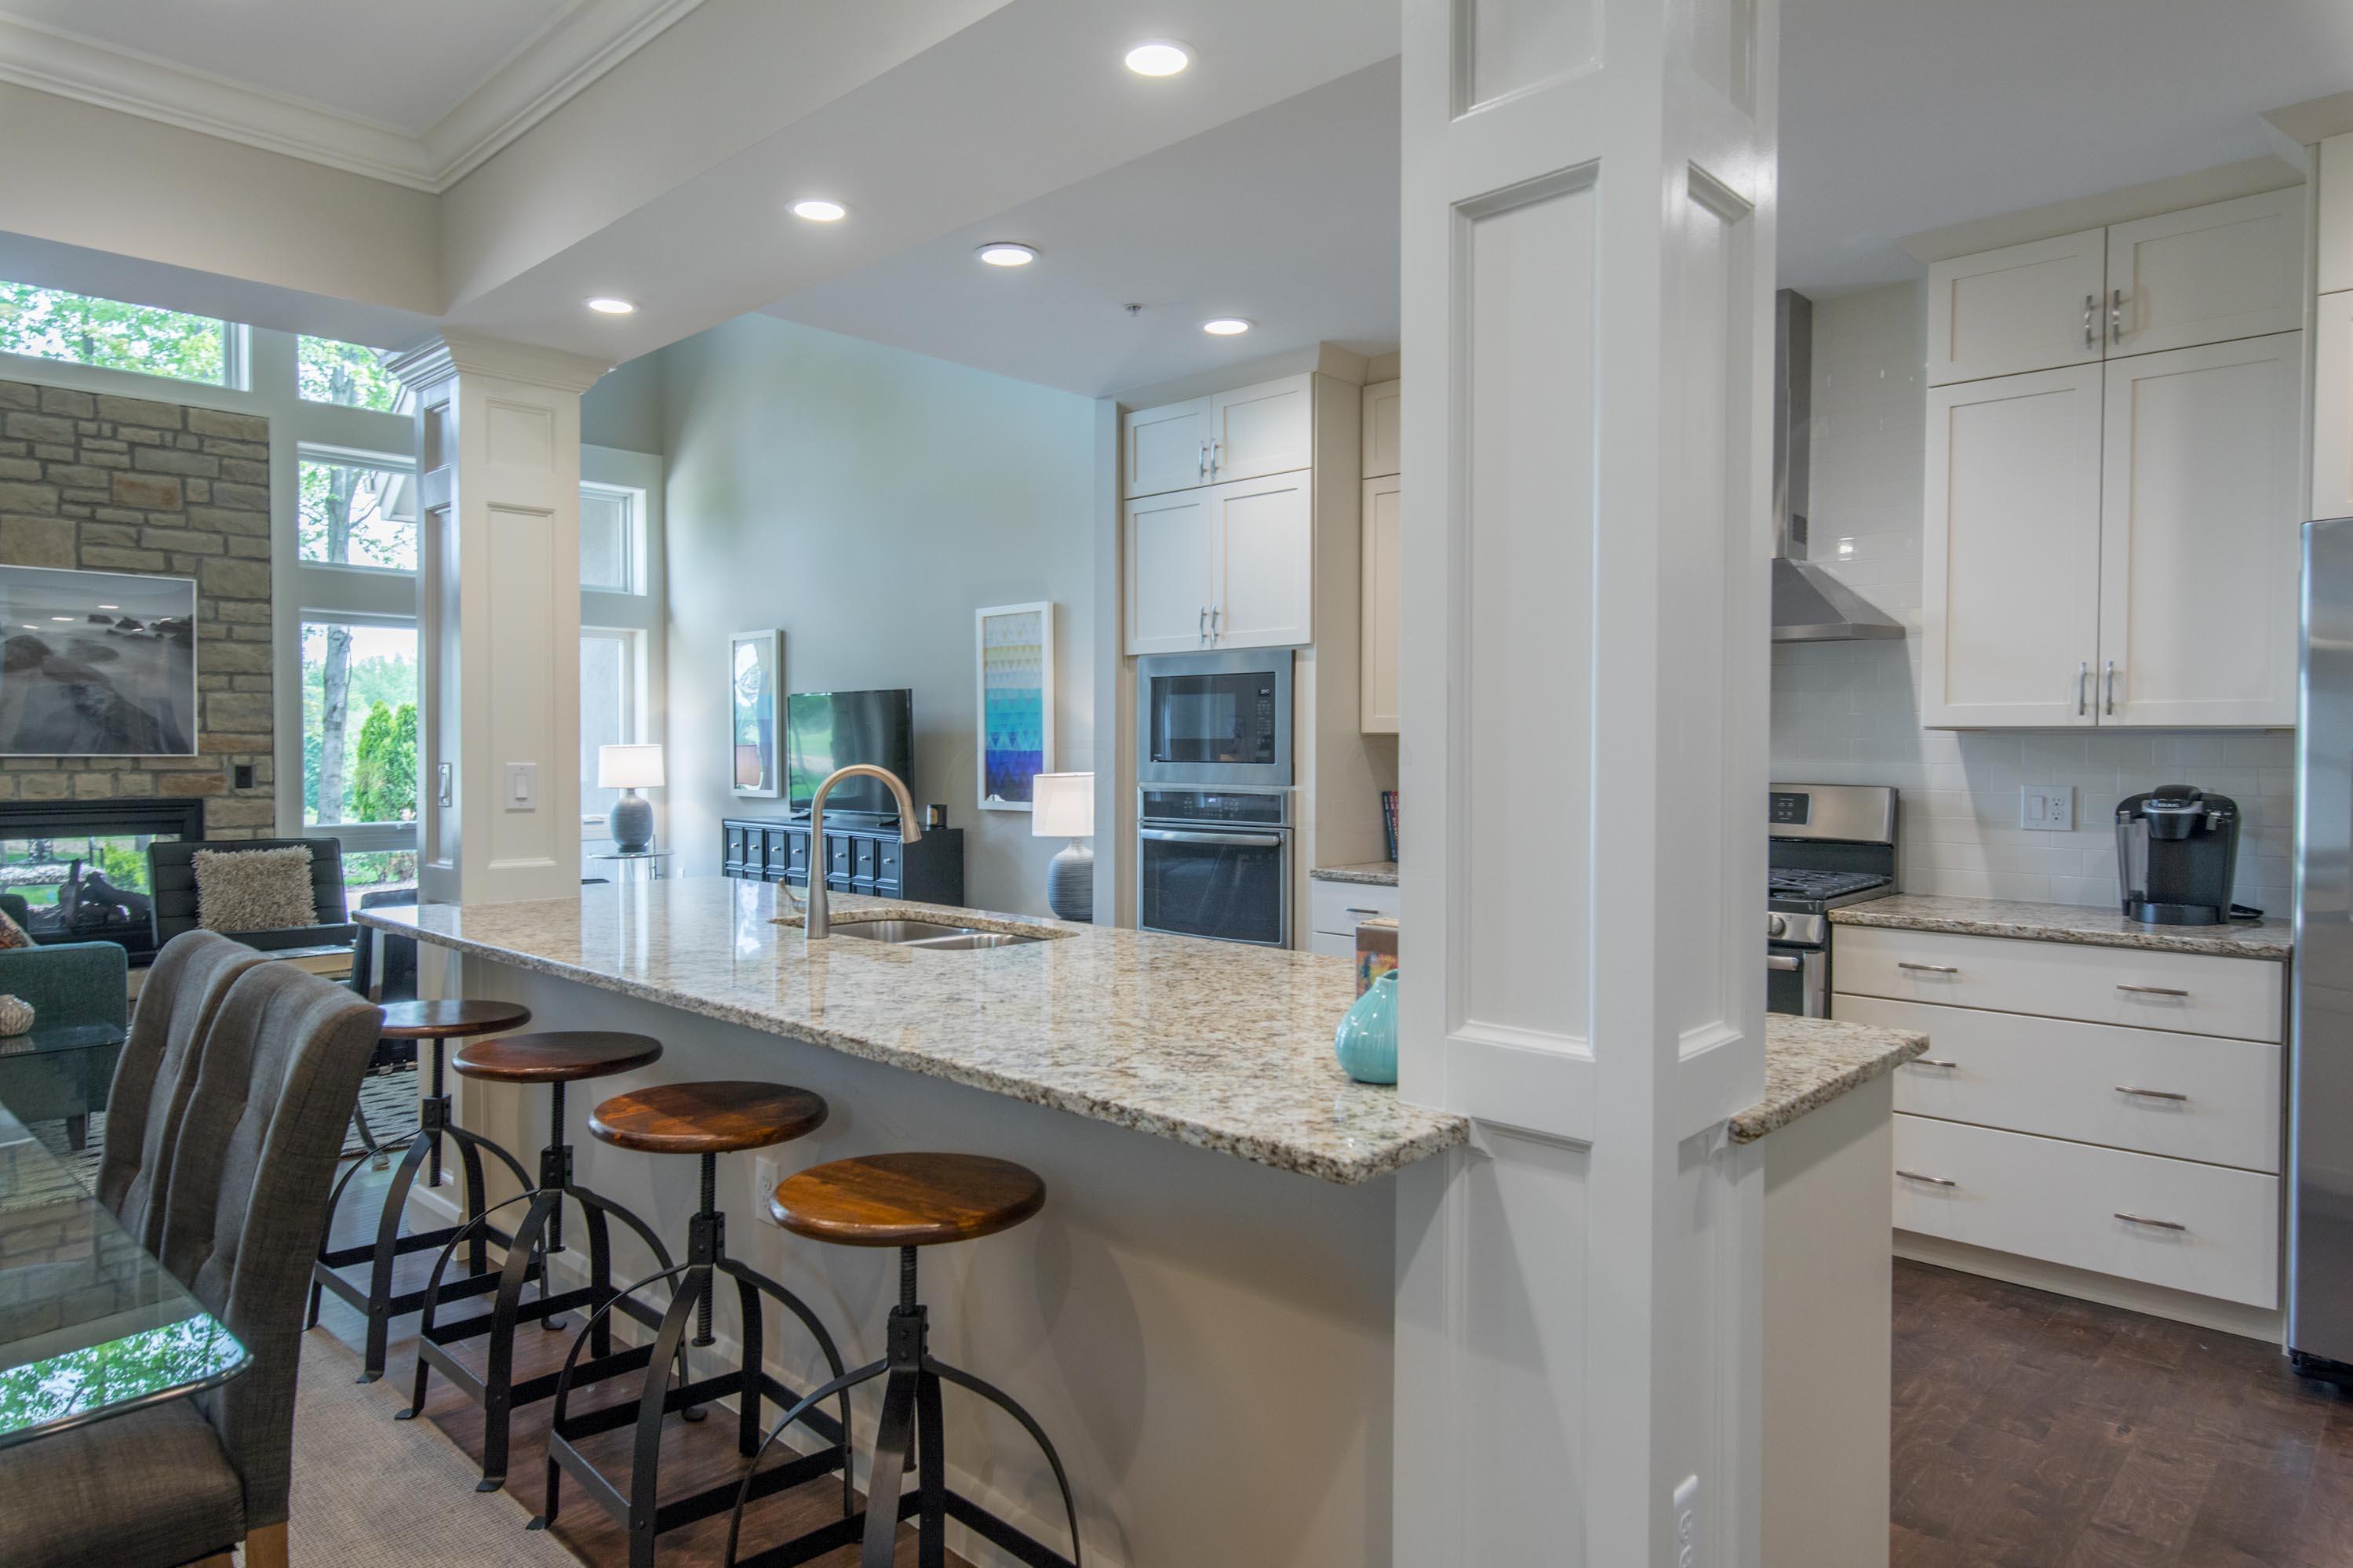 718 Fairway Boulevard, Columbus, Ohio 43213, 3 Bedrooms Bedrooms, ,3 BathroomsBathrooms,Residential,For Sale,Fairway,219018543